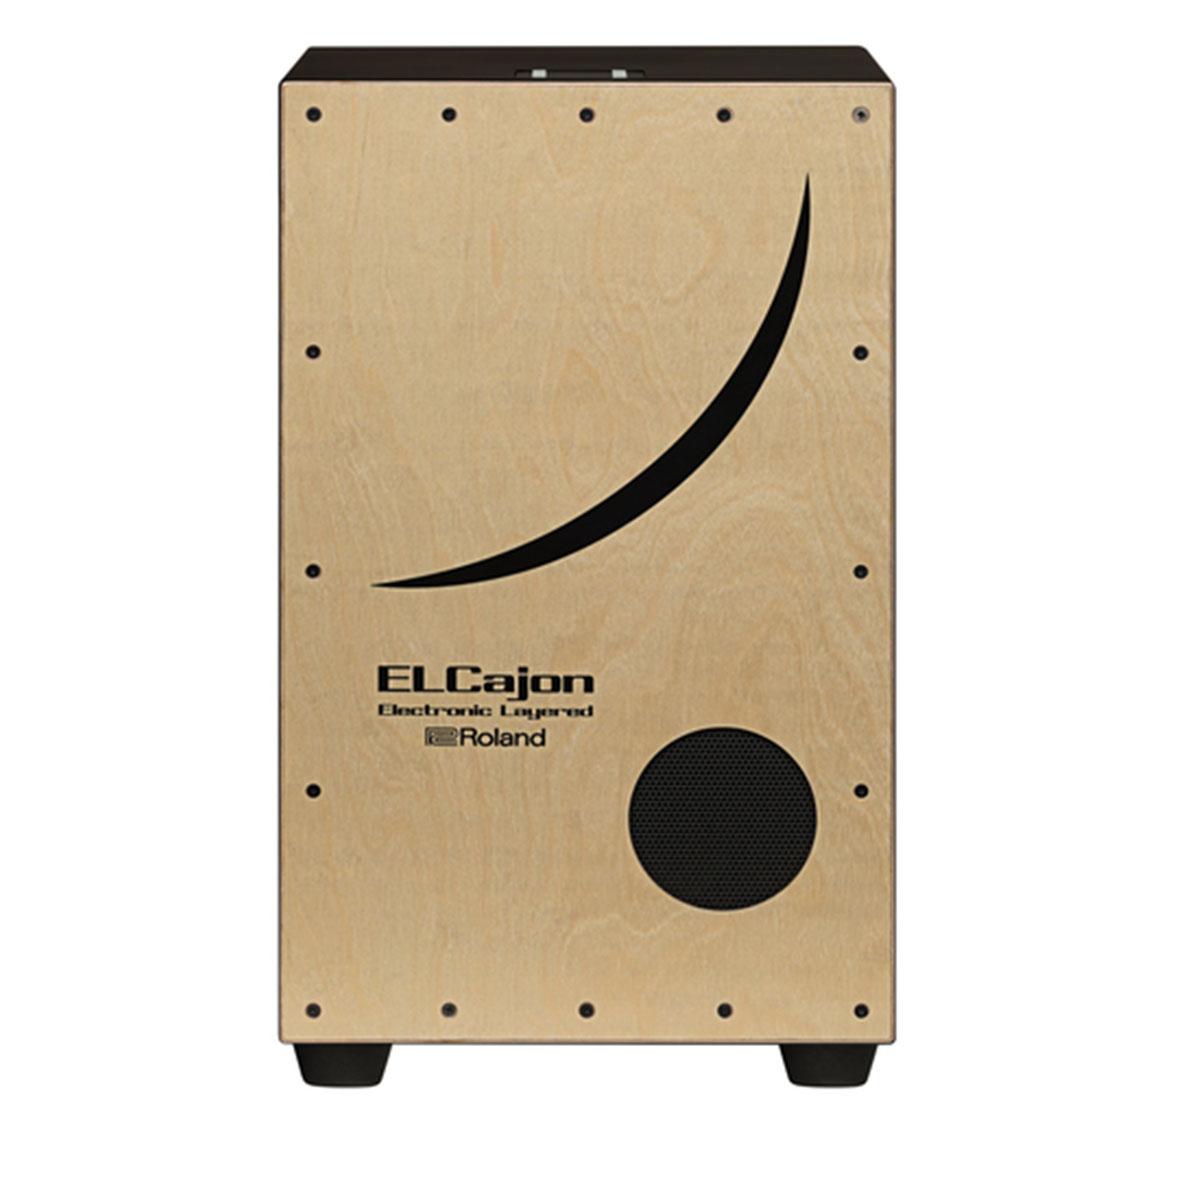 Roland - ELCajon EC-10 Cajon électronique